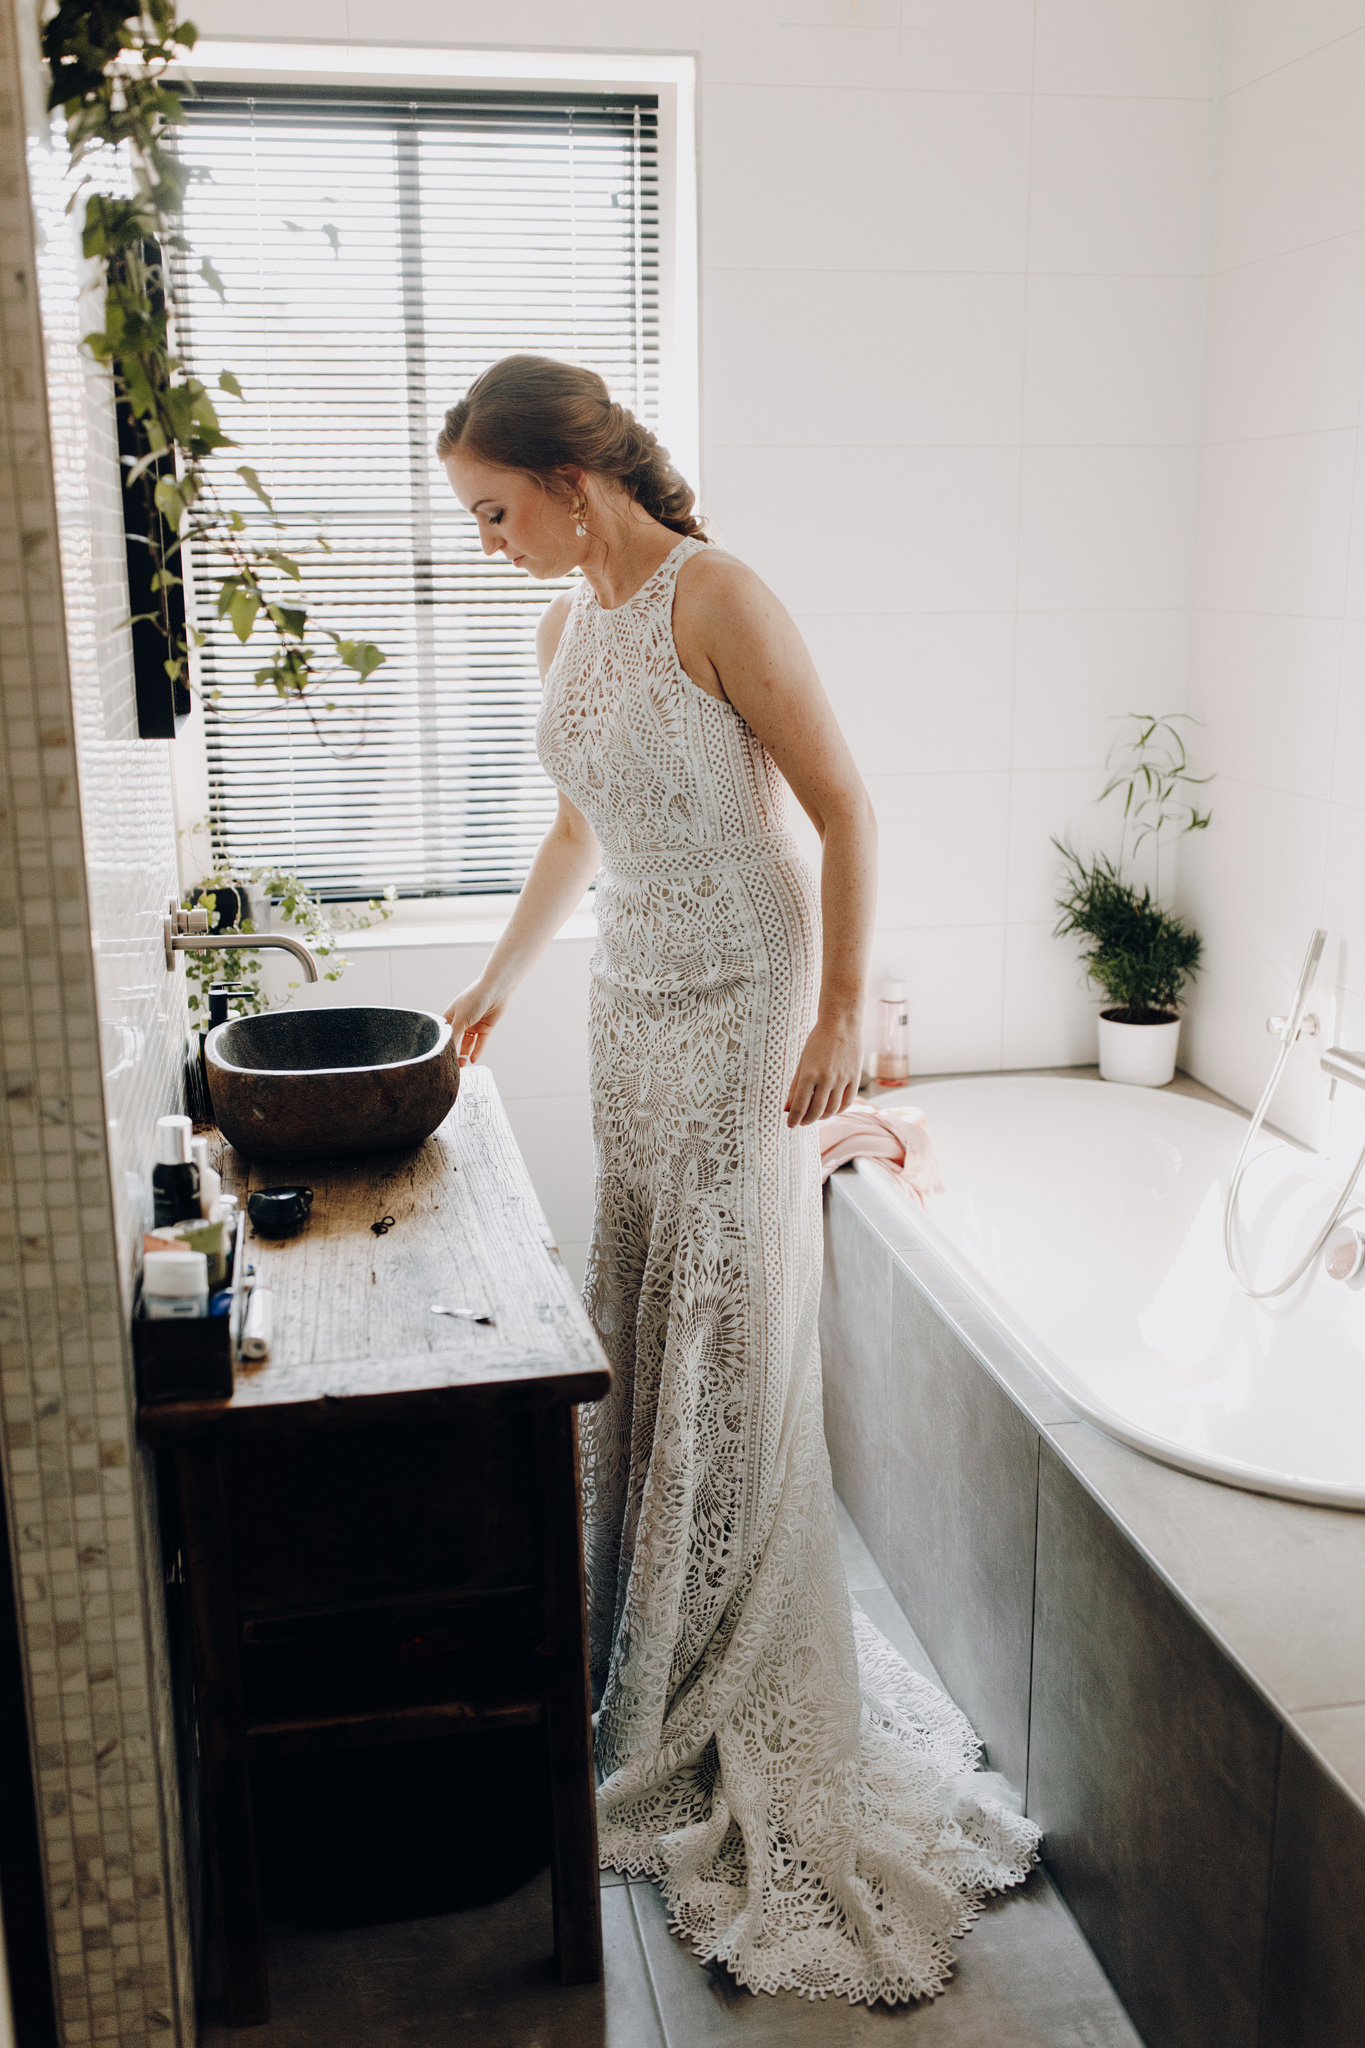 Bruid in badkamer met Lillian West trouwjurk